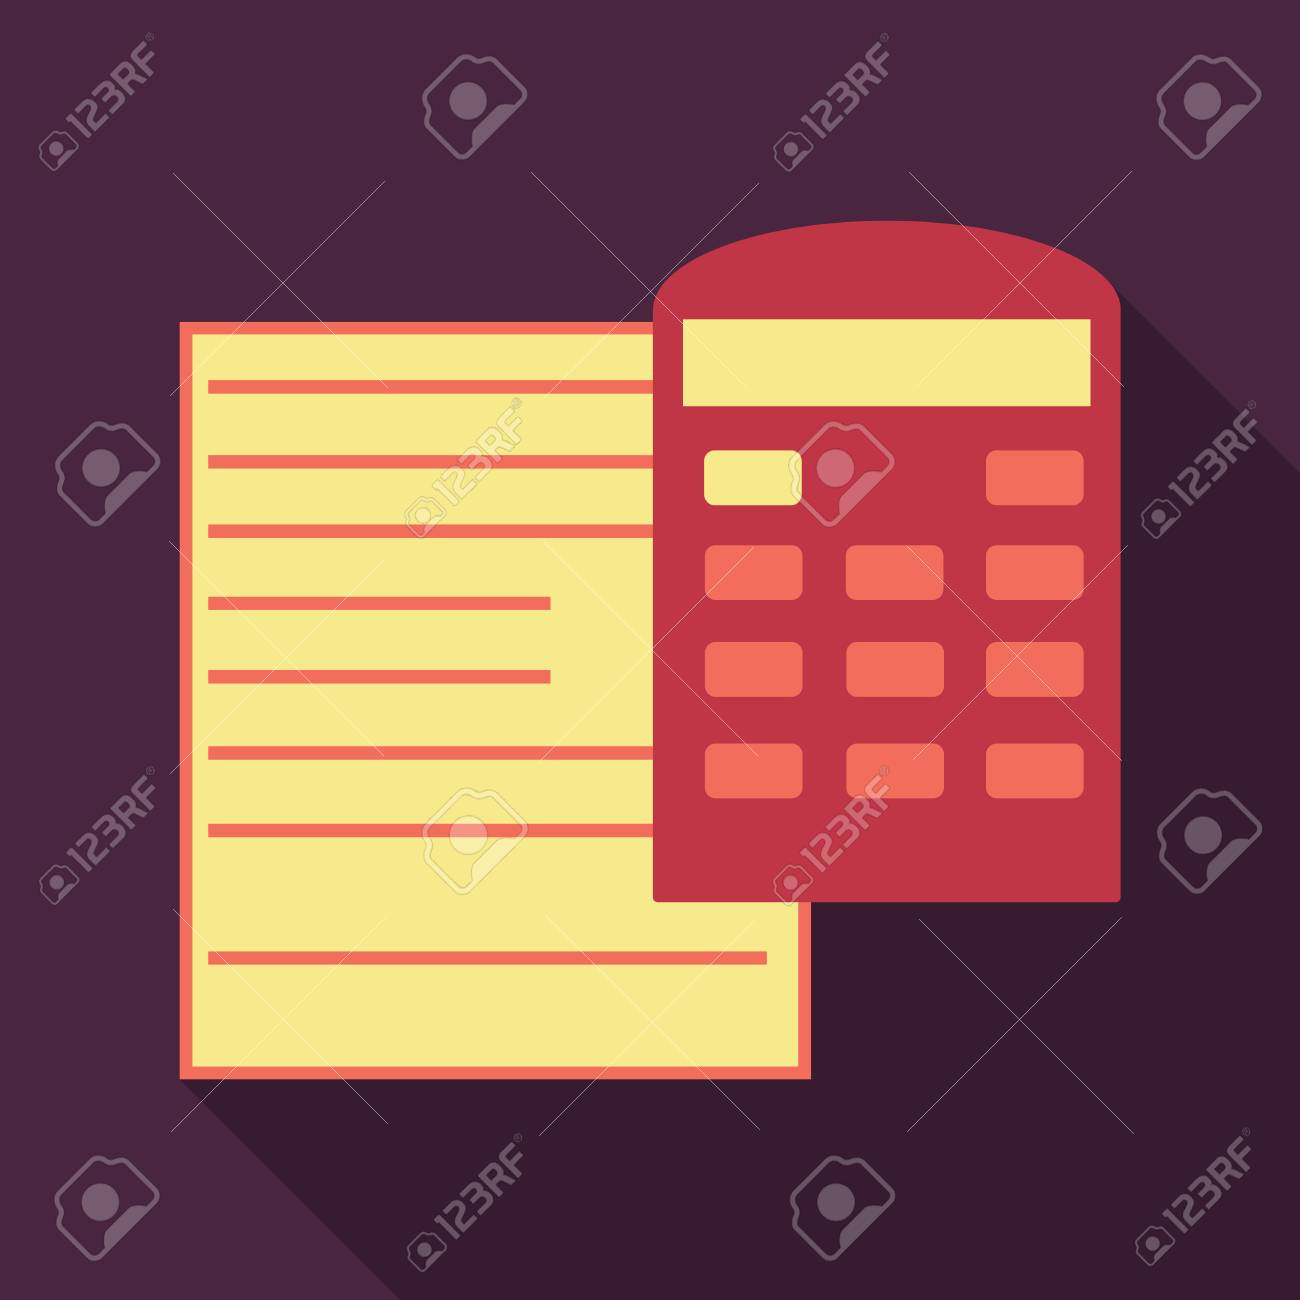 tax accounting budget calculation clipboard tax form calculator